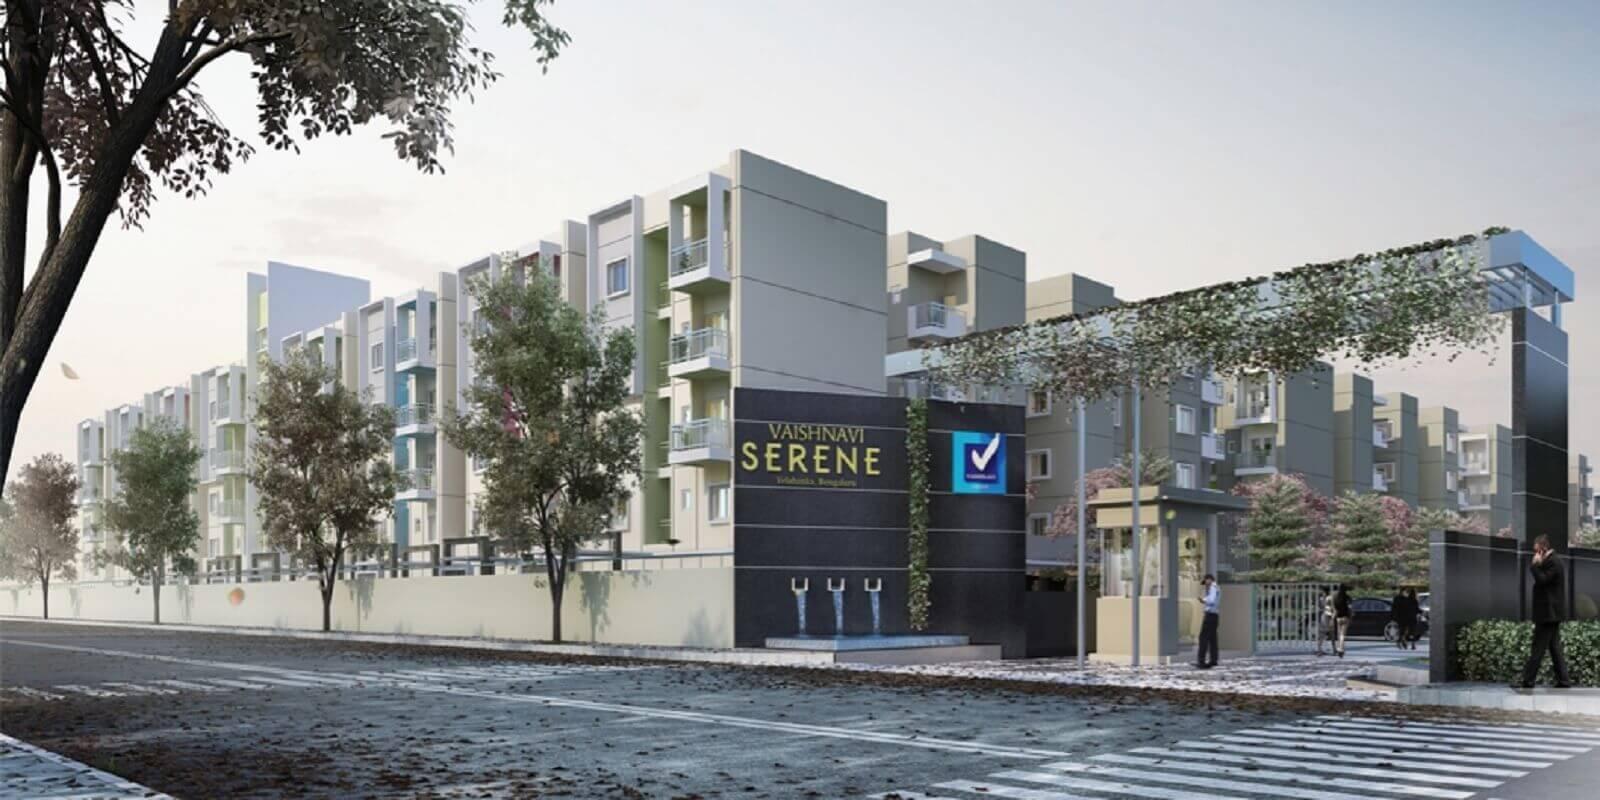 vaishnavi serene project large image1